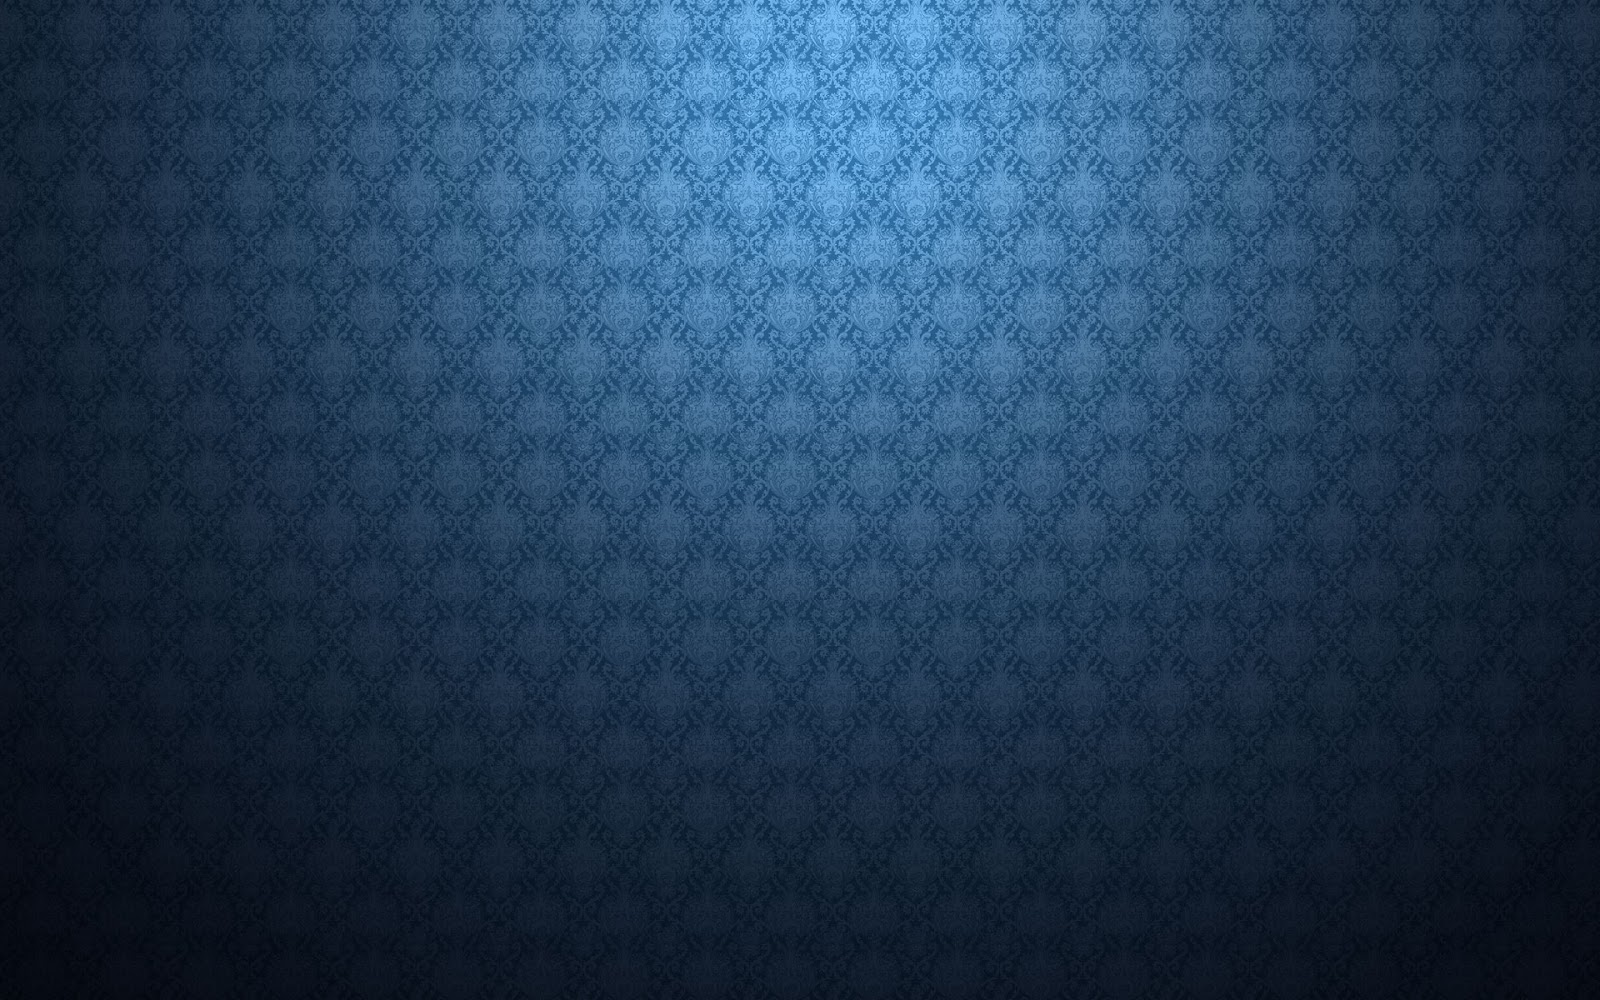 Download Amazing Blue Art Background Hd Wallpaper | Full HD Wallpapers